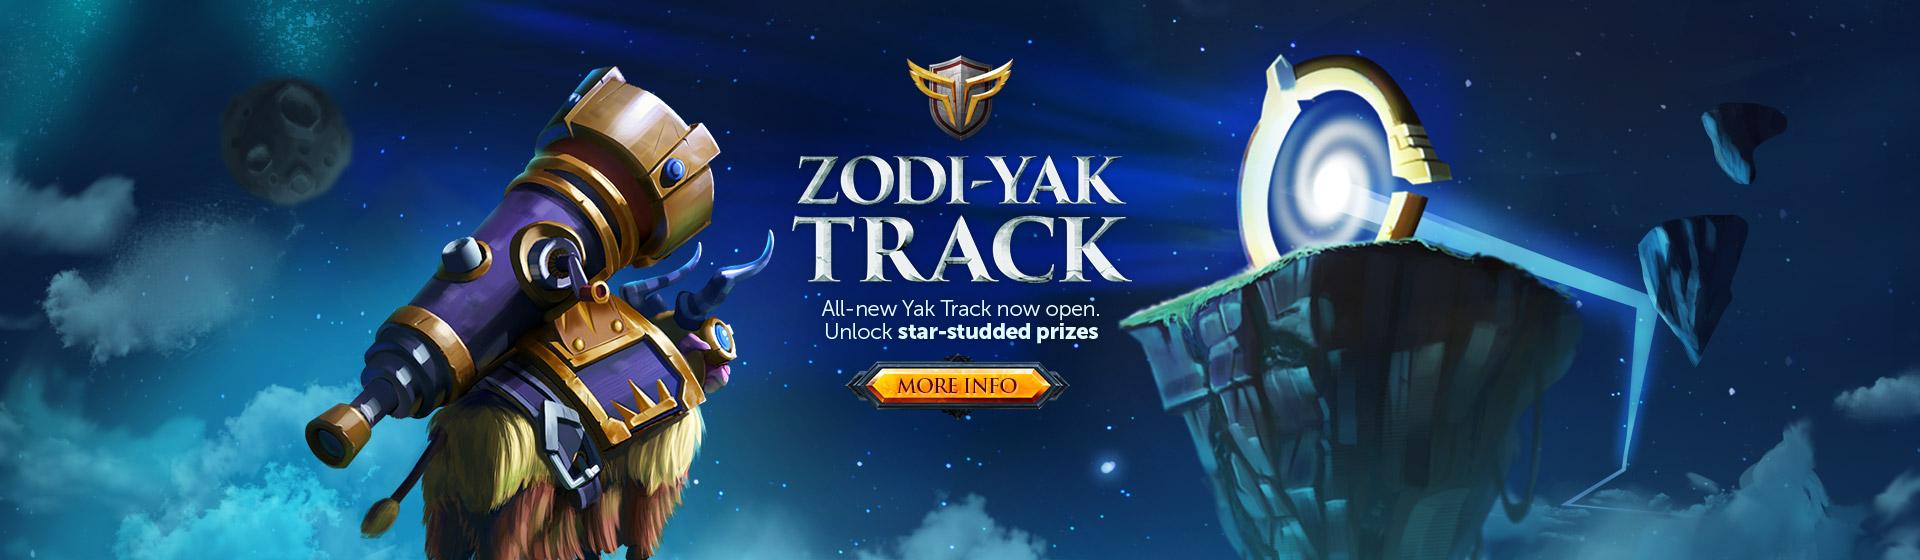 Zodi-Yak Track